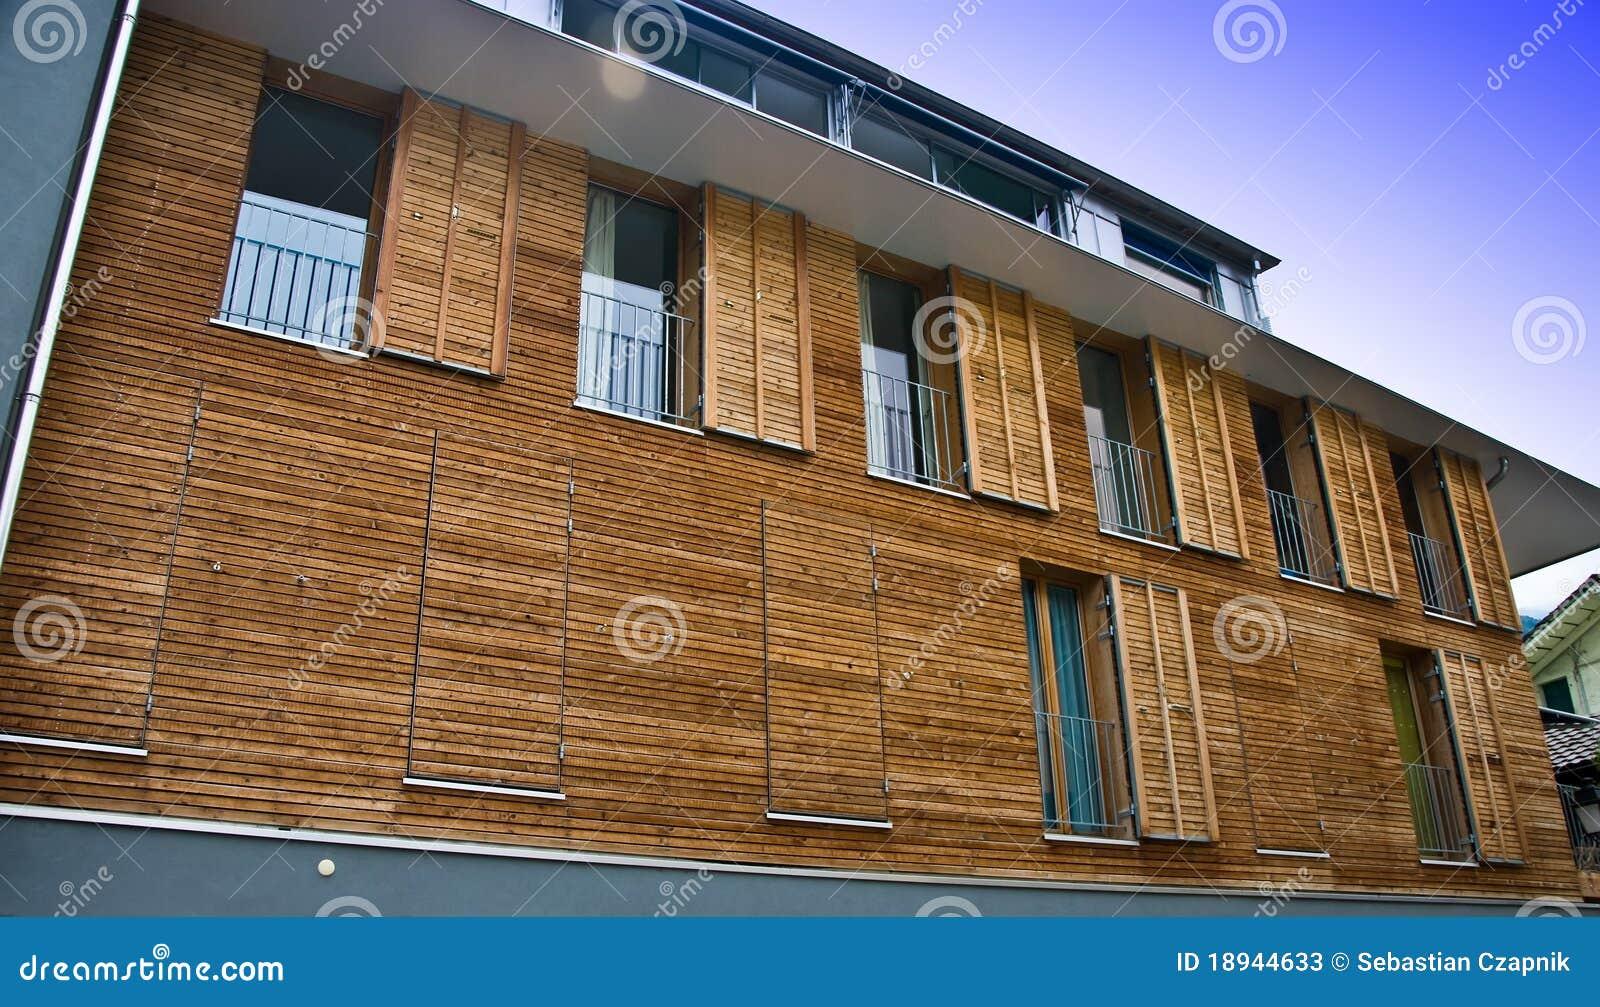 Fachada de madera moderna de la casa fotos de archivo - Casas modernas de madera ...